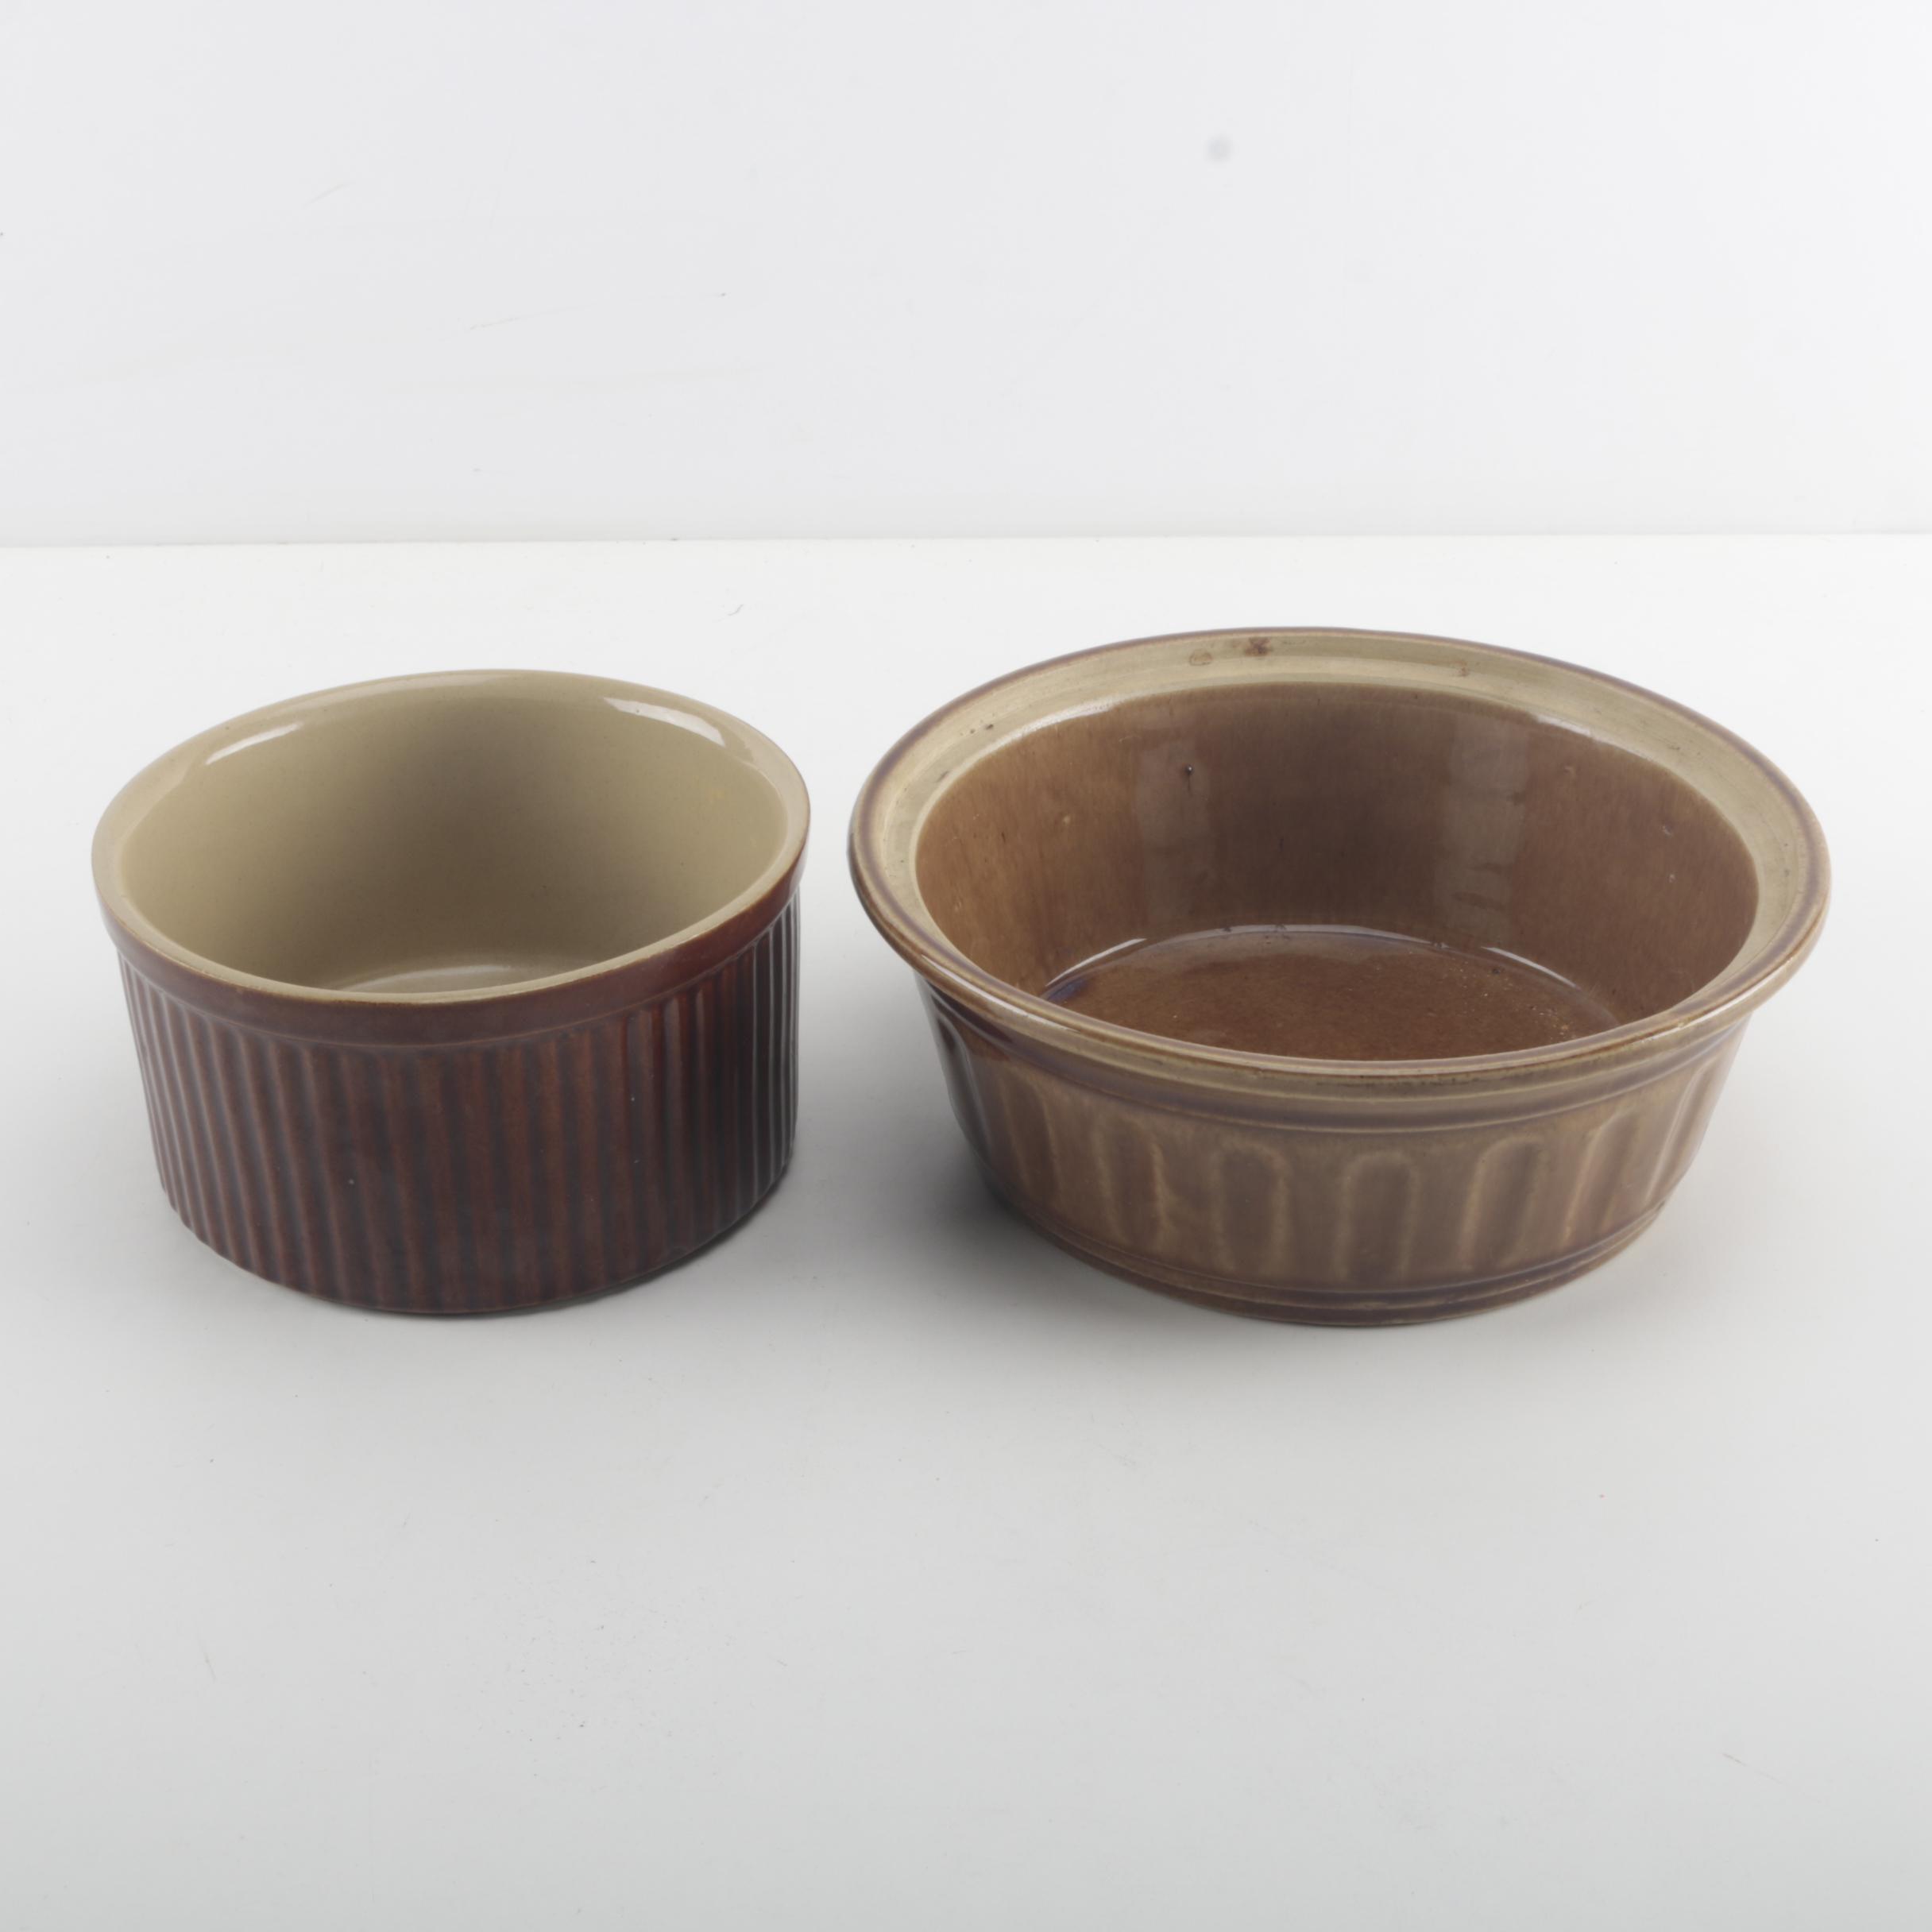 Brown Stoneware Bowls